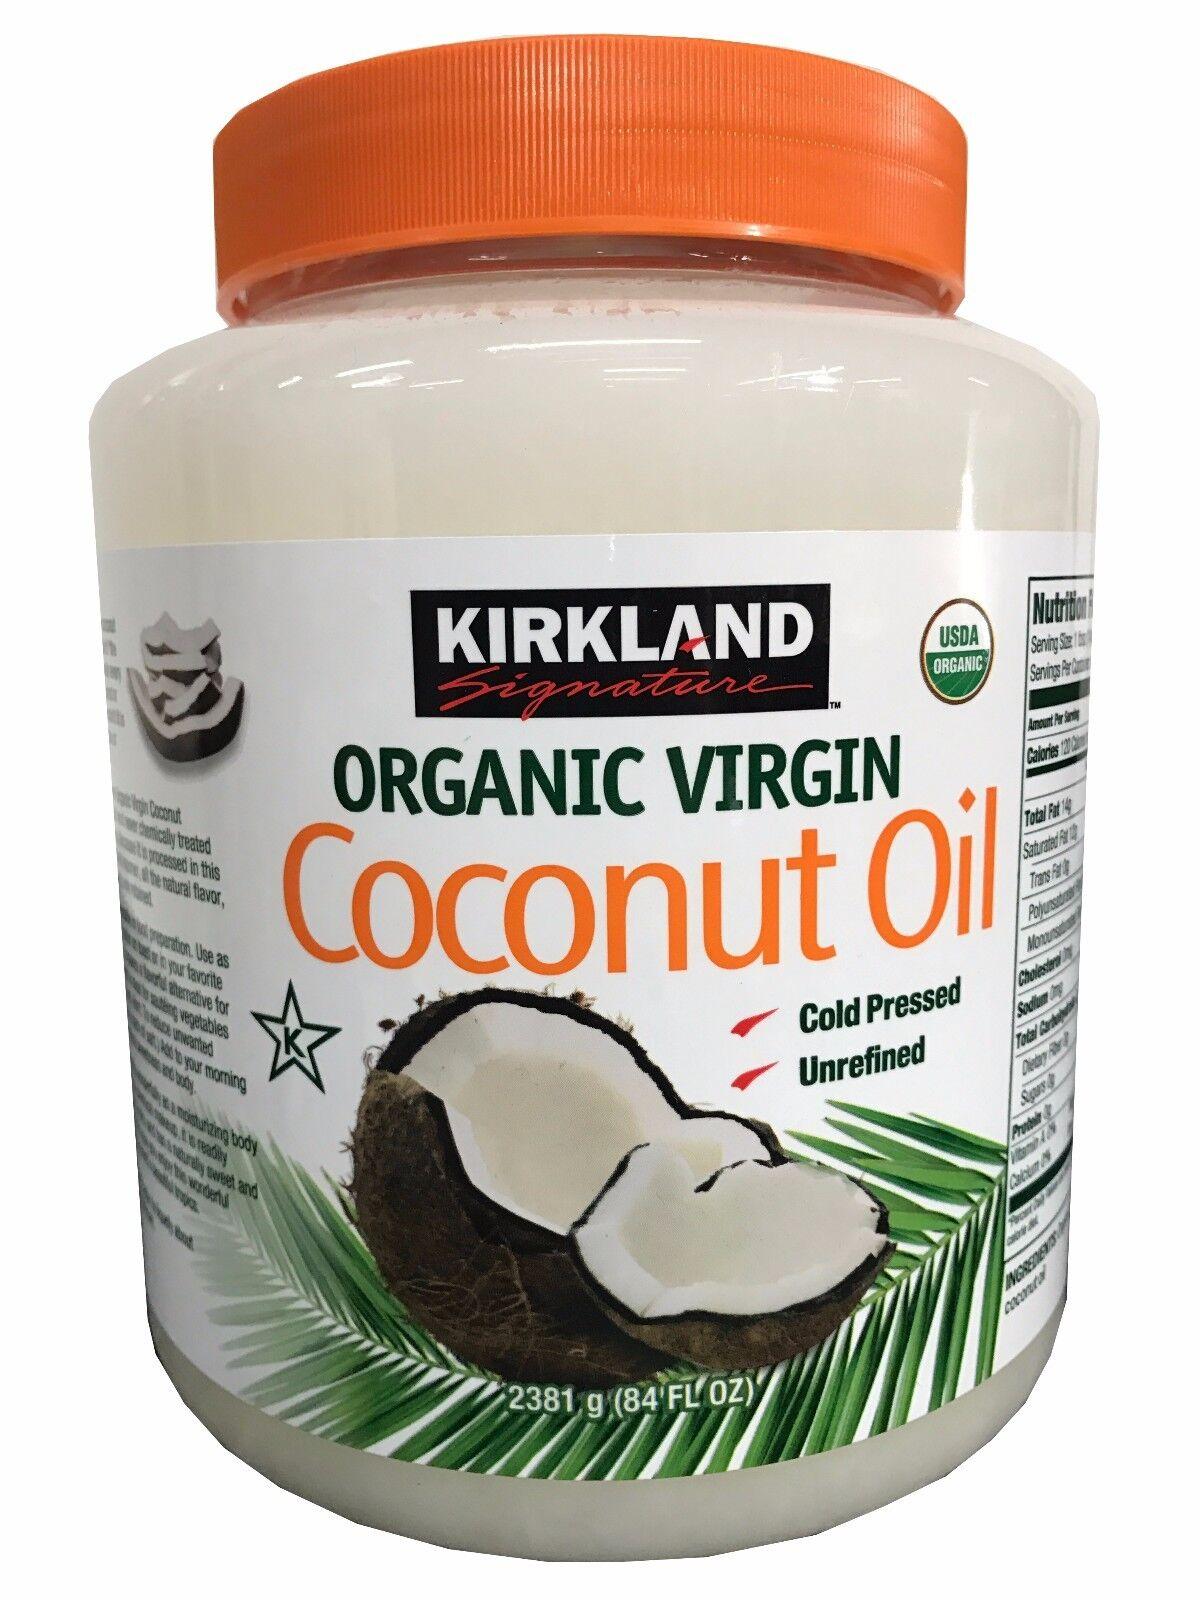 Kirkland signature cold pressed unrefined organic virgin coconut oil resntentobalflowflowcomponentncel nvjuhfo Images